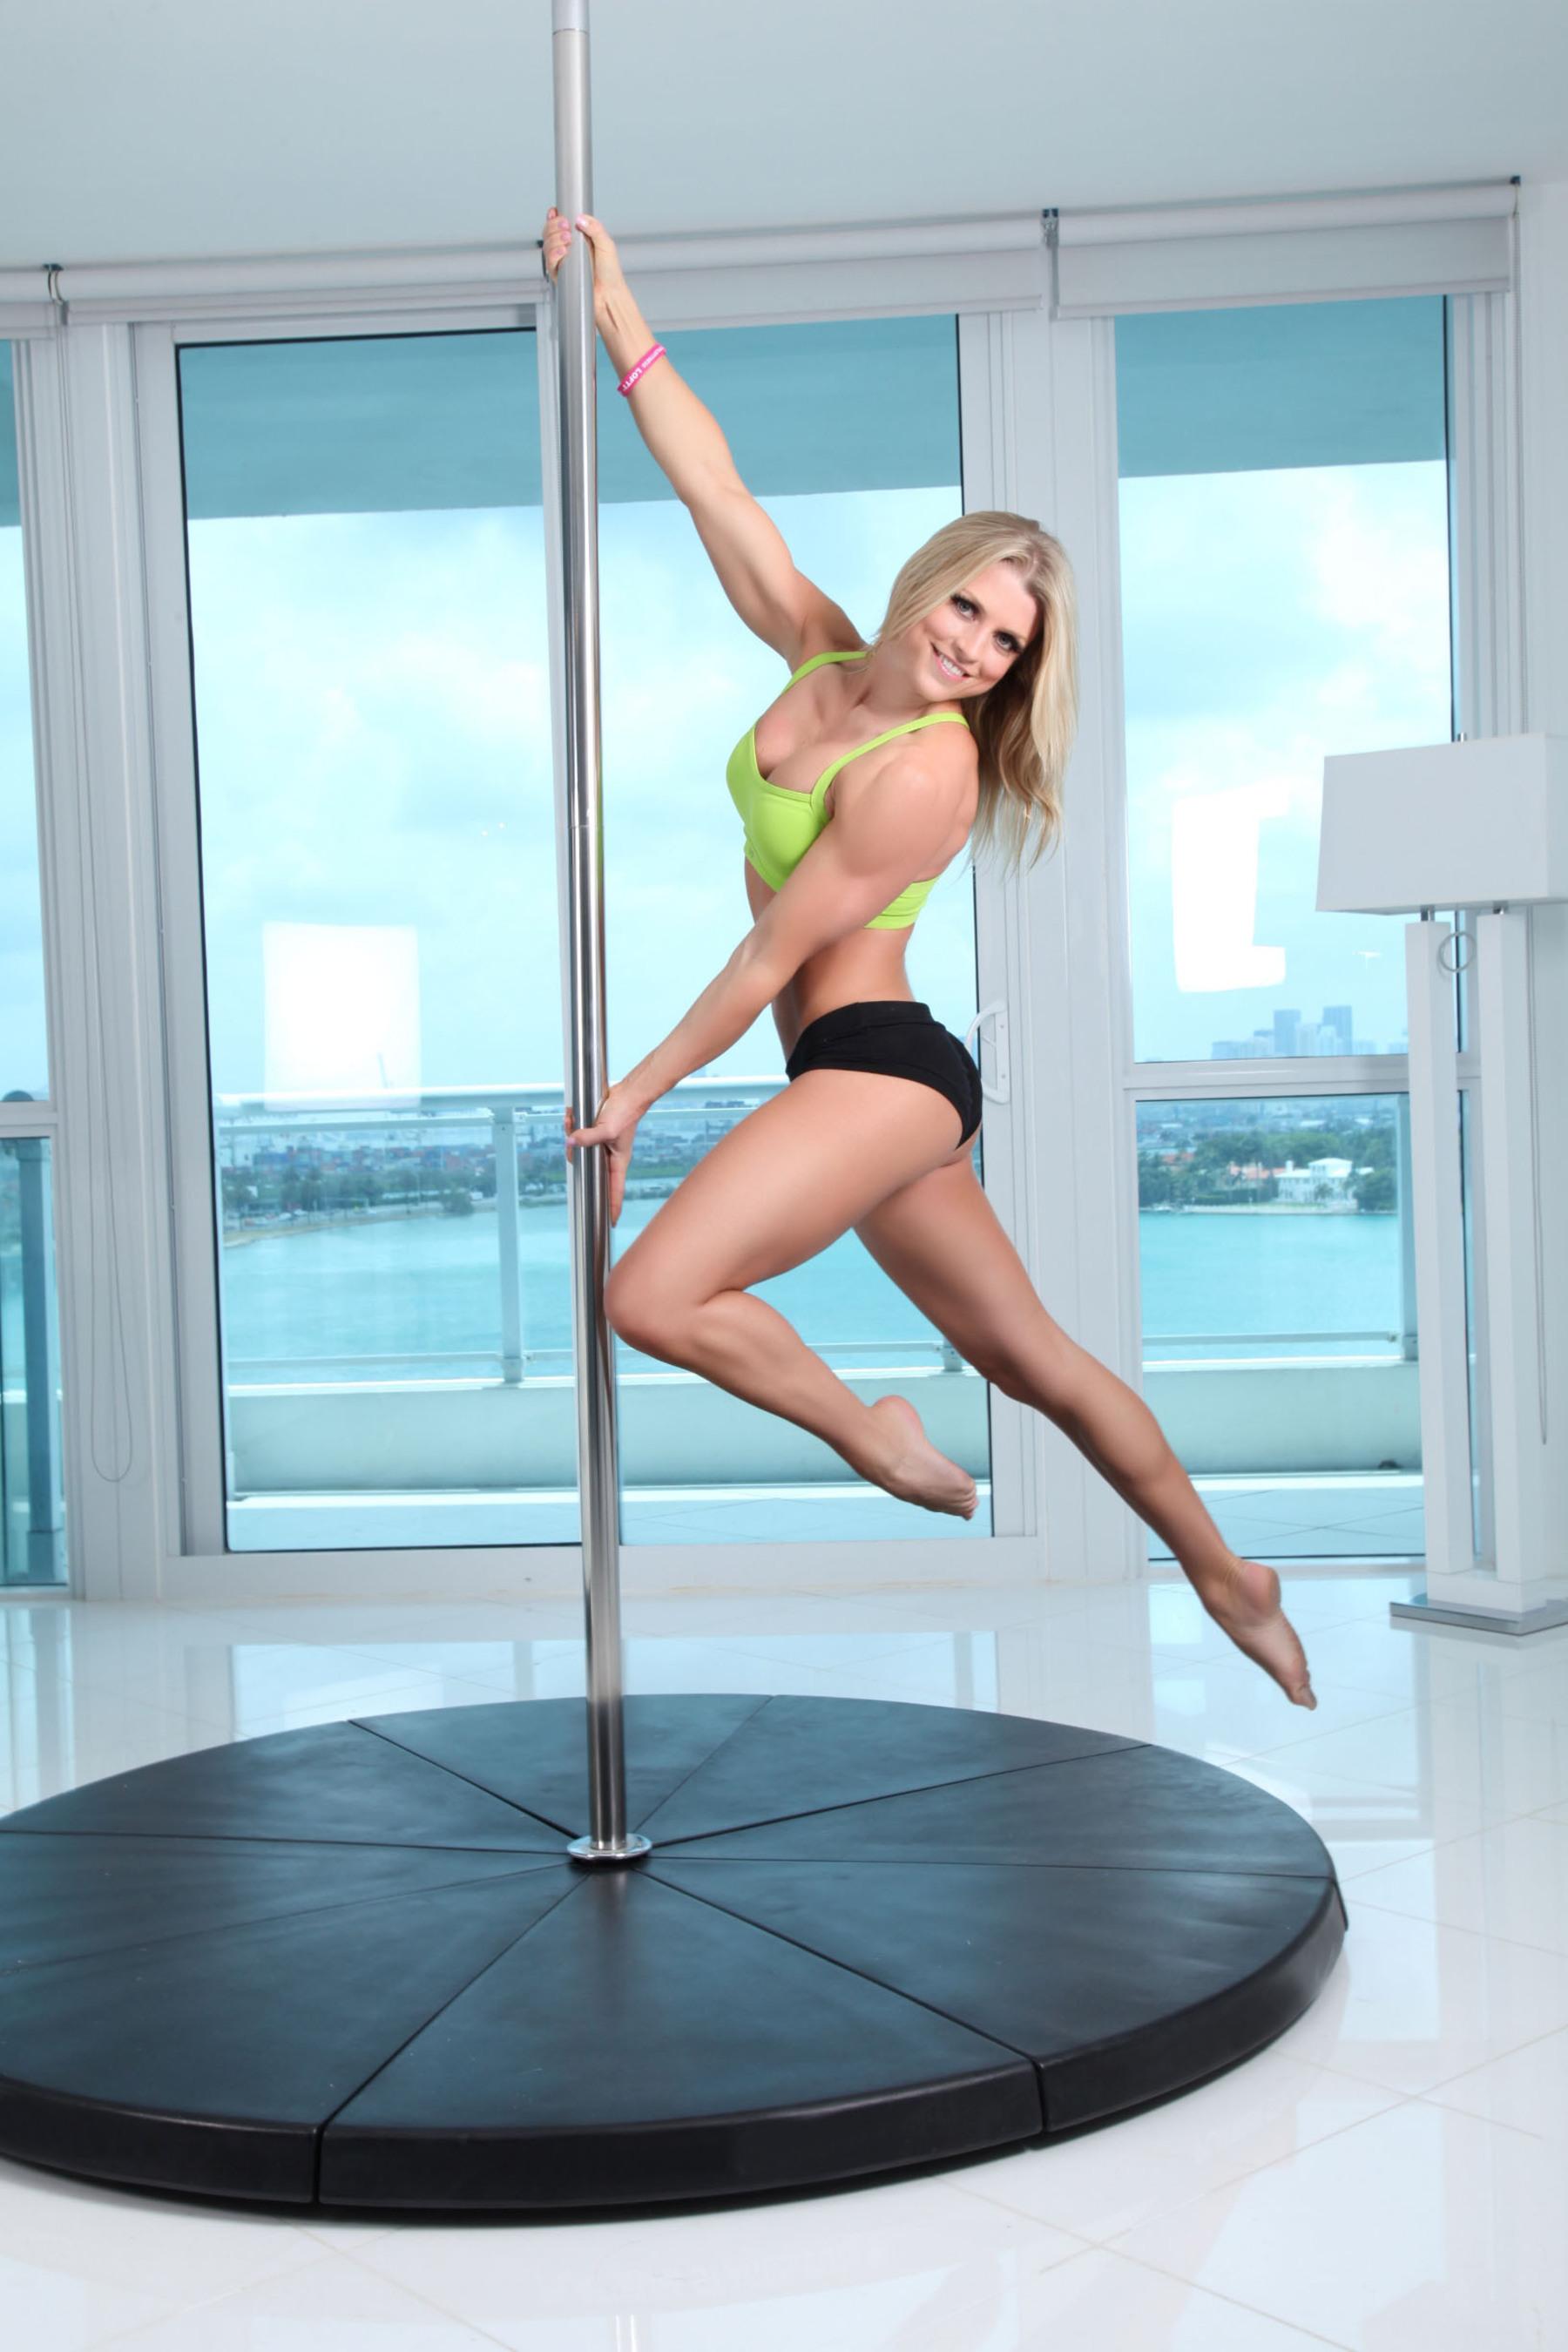 Pole Expo Founder & Owner Fawnia Dietrich. (PRNewsFoto/Pole Expo)